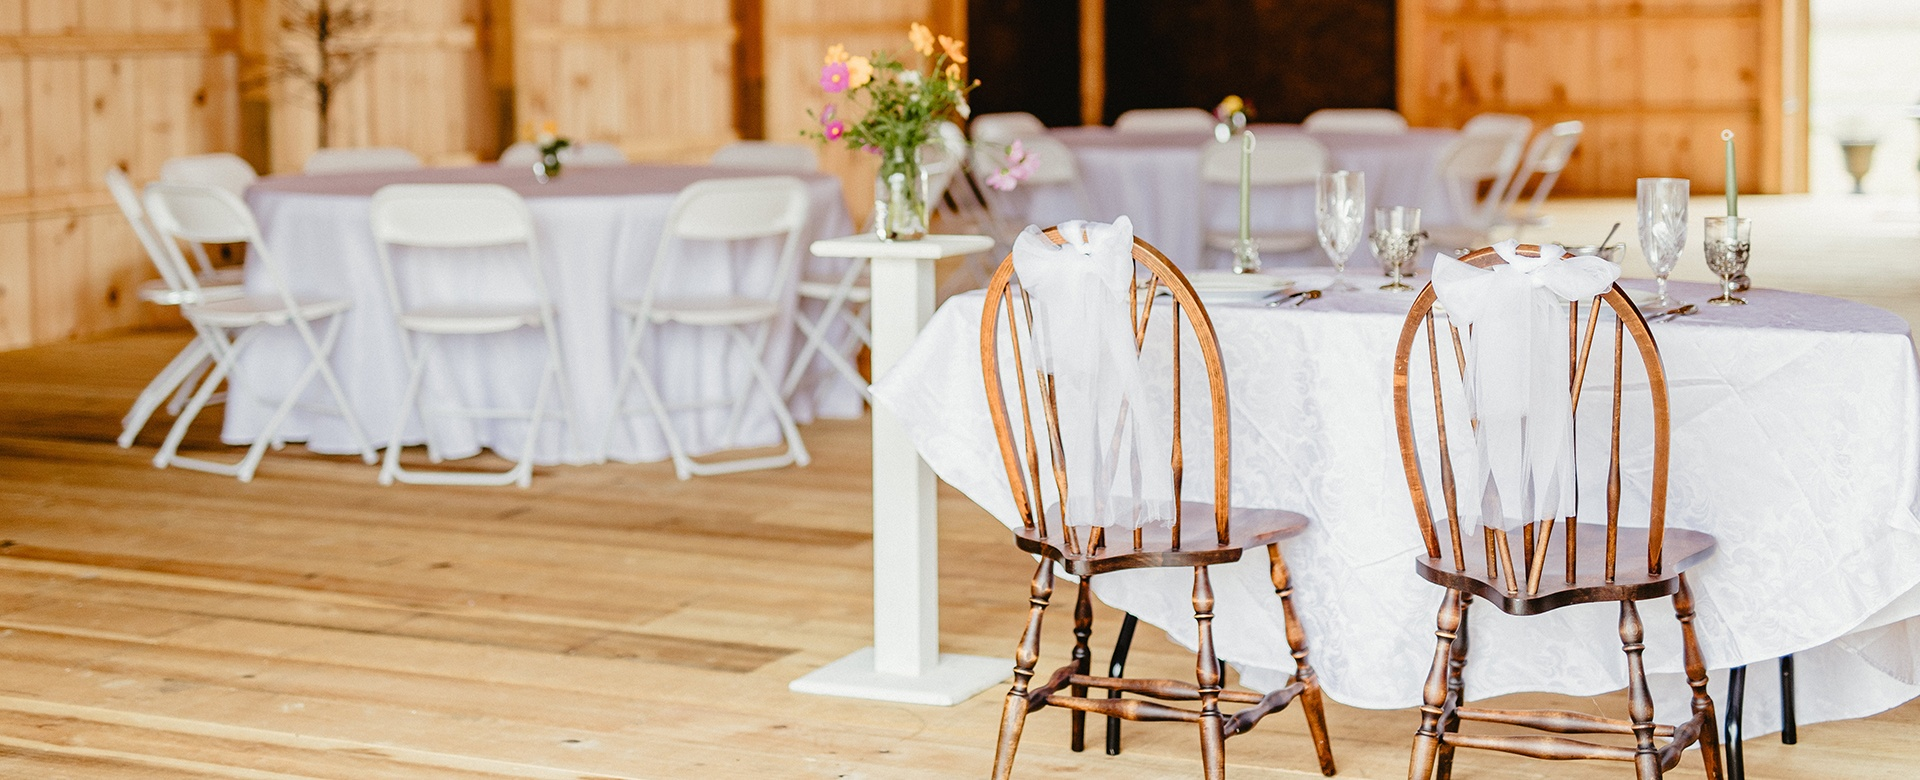 Customize Your Wedding